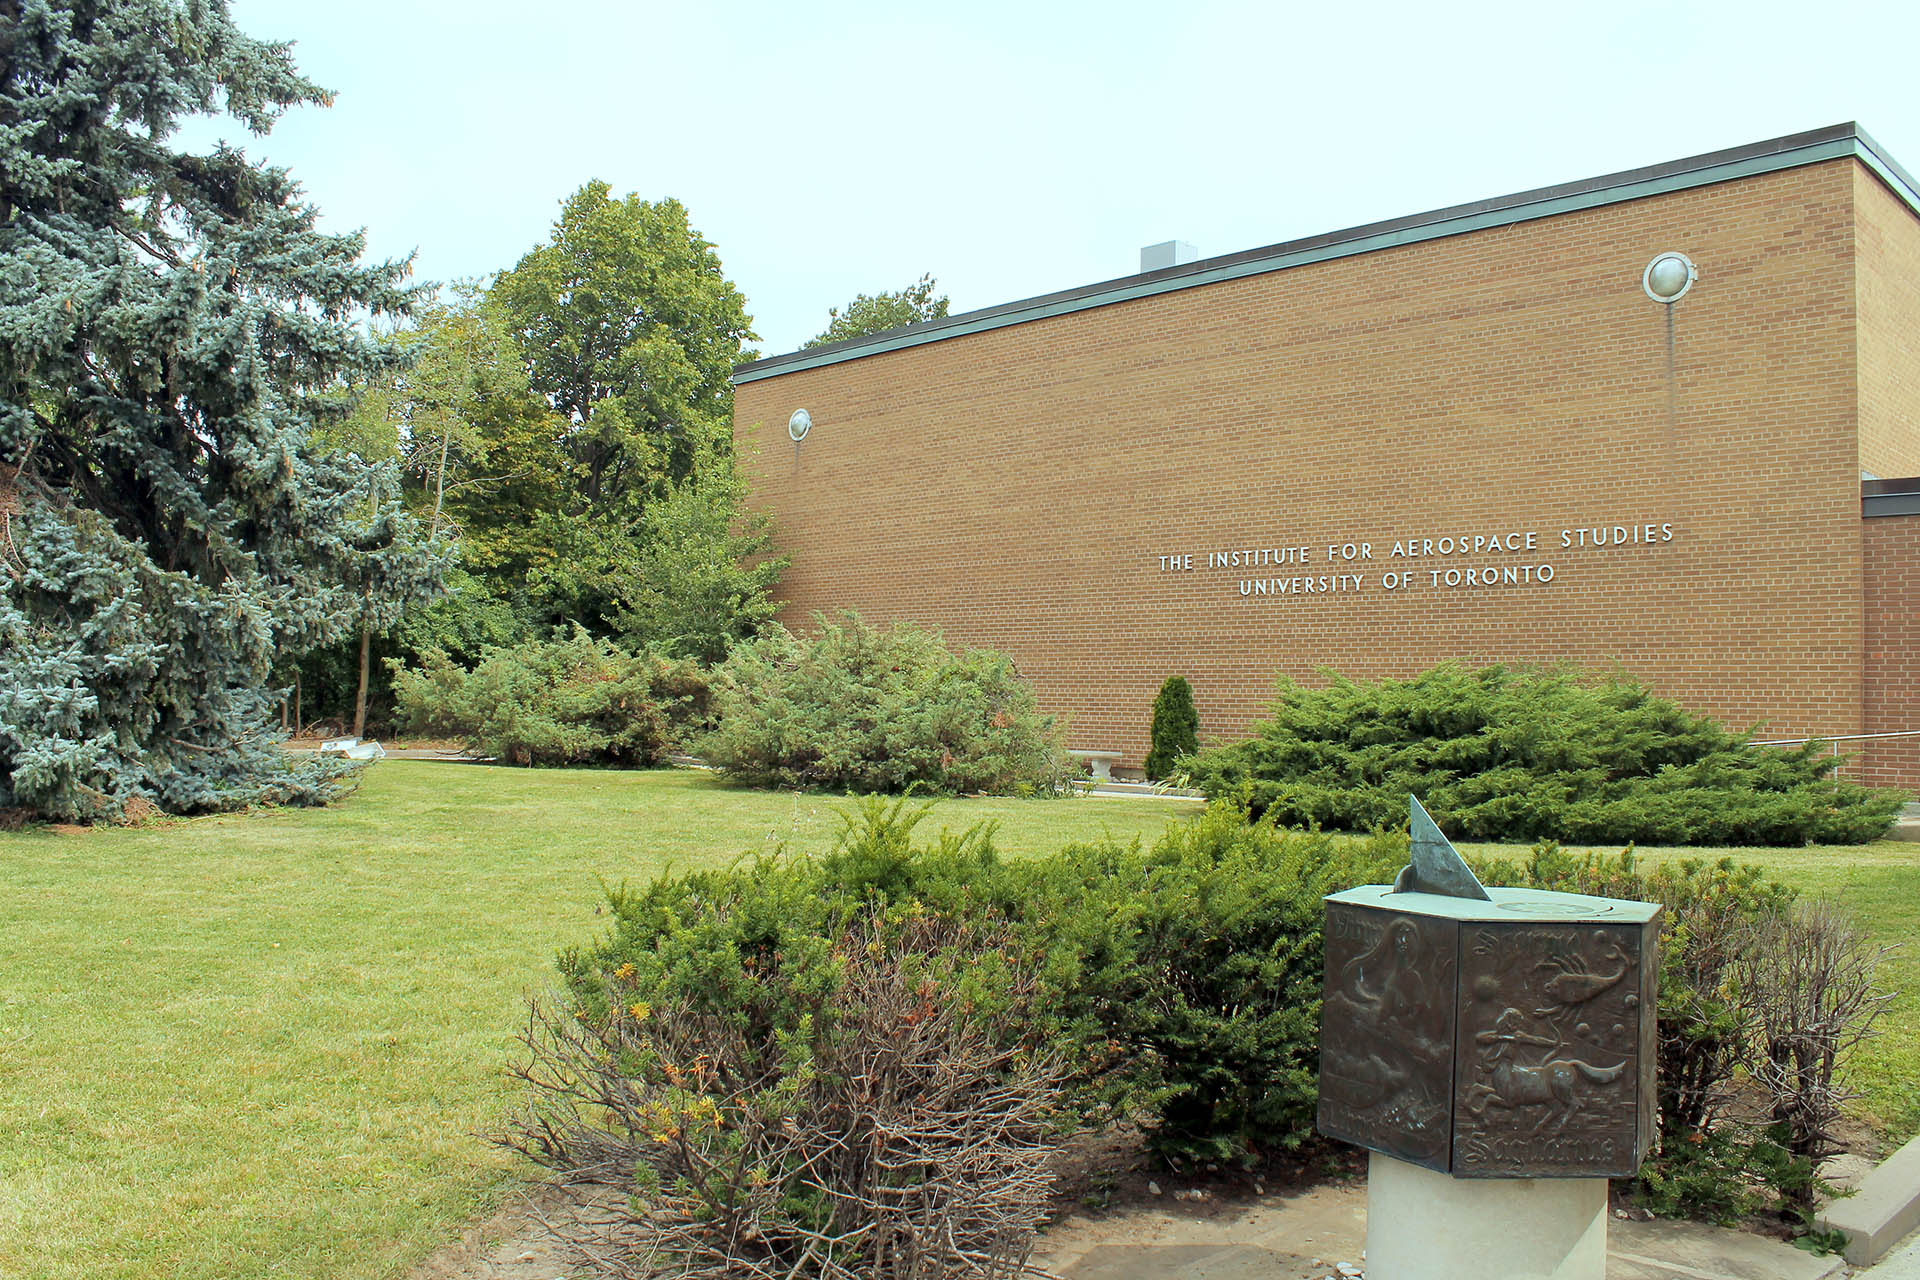 The UTIAS building at University of Toronto North Campus.